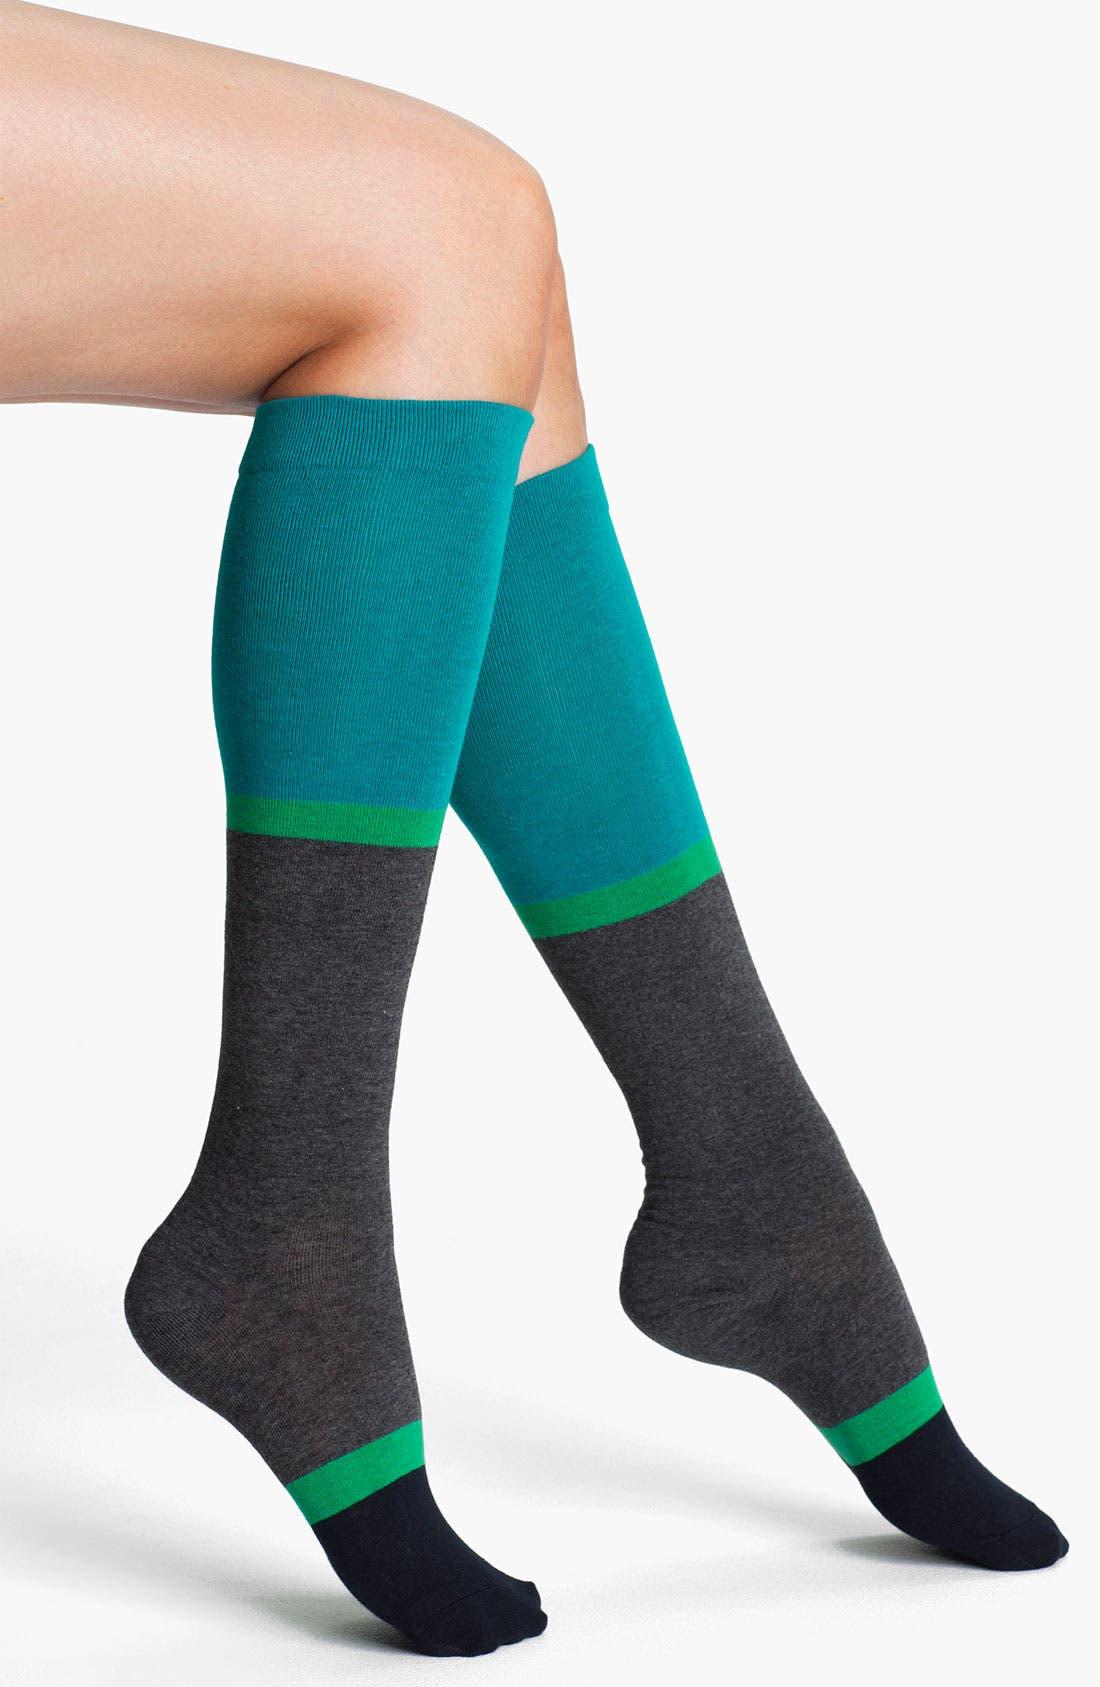 Alternate Image 1 Selected - Hue Colorblock Knee Socks